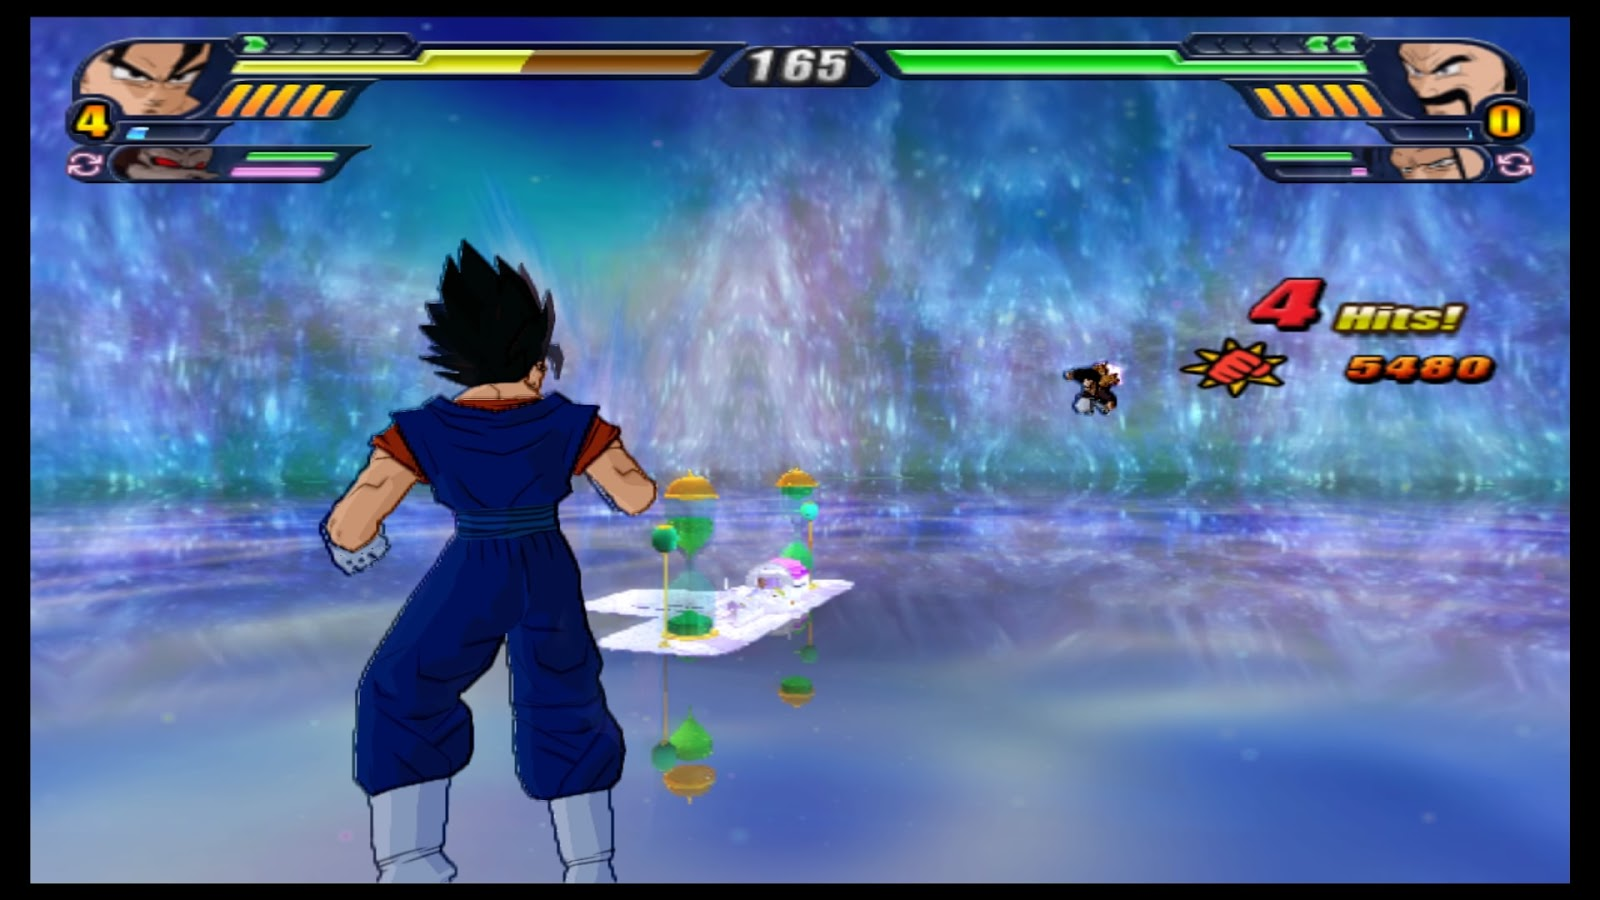 Dragon Ball Z Budokai Tenkaichi 3 Ps2 A Ps4 Usa 5 05 Mega